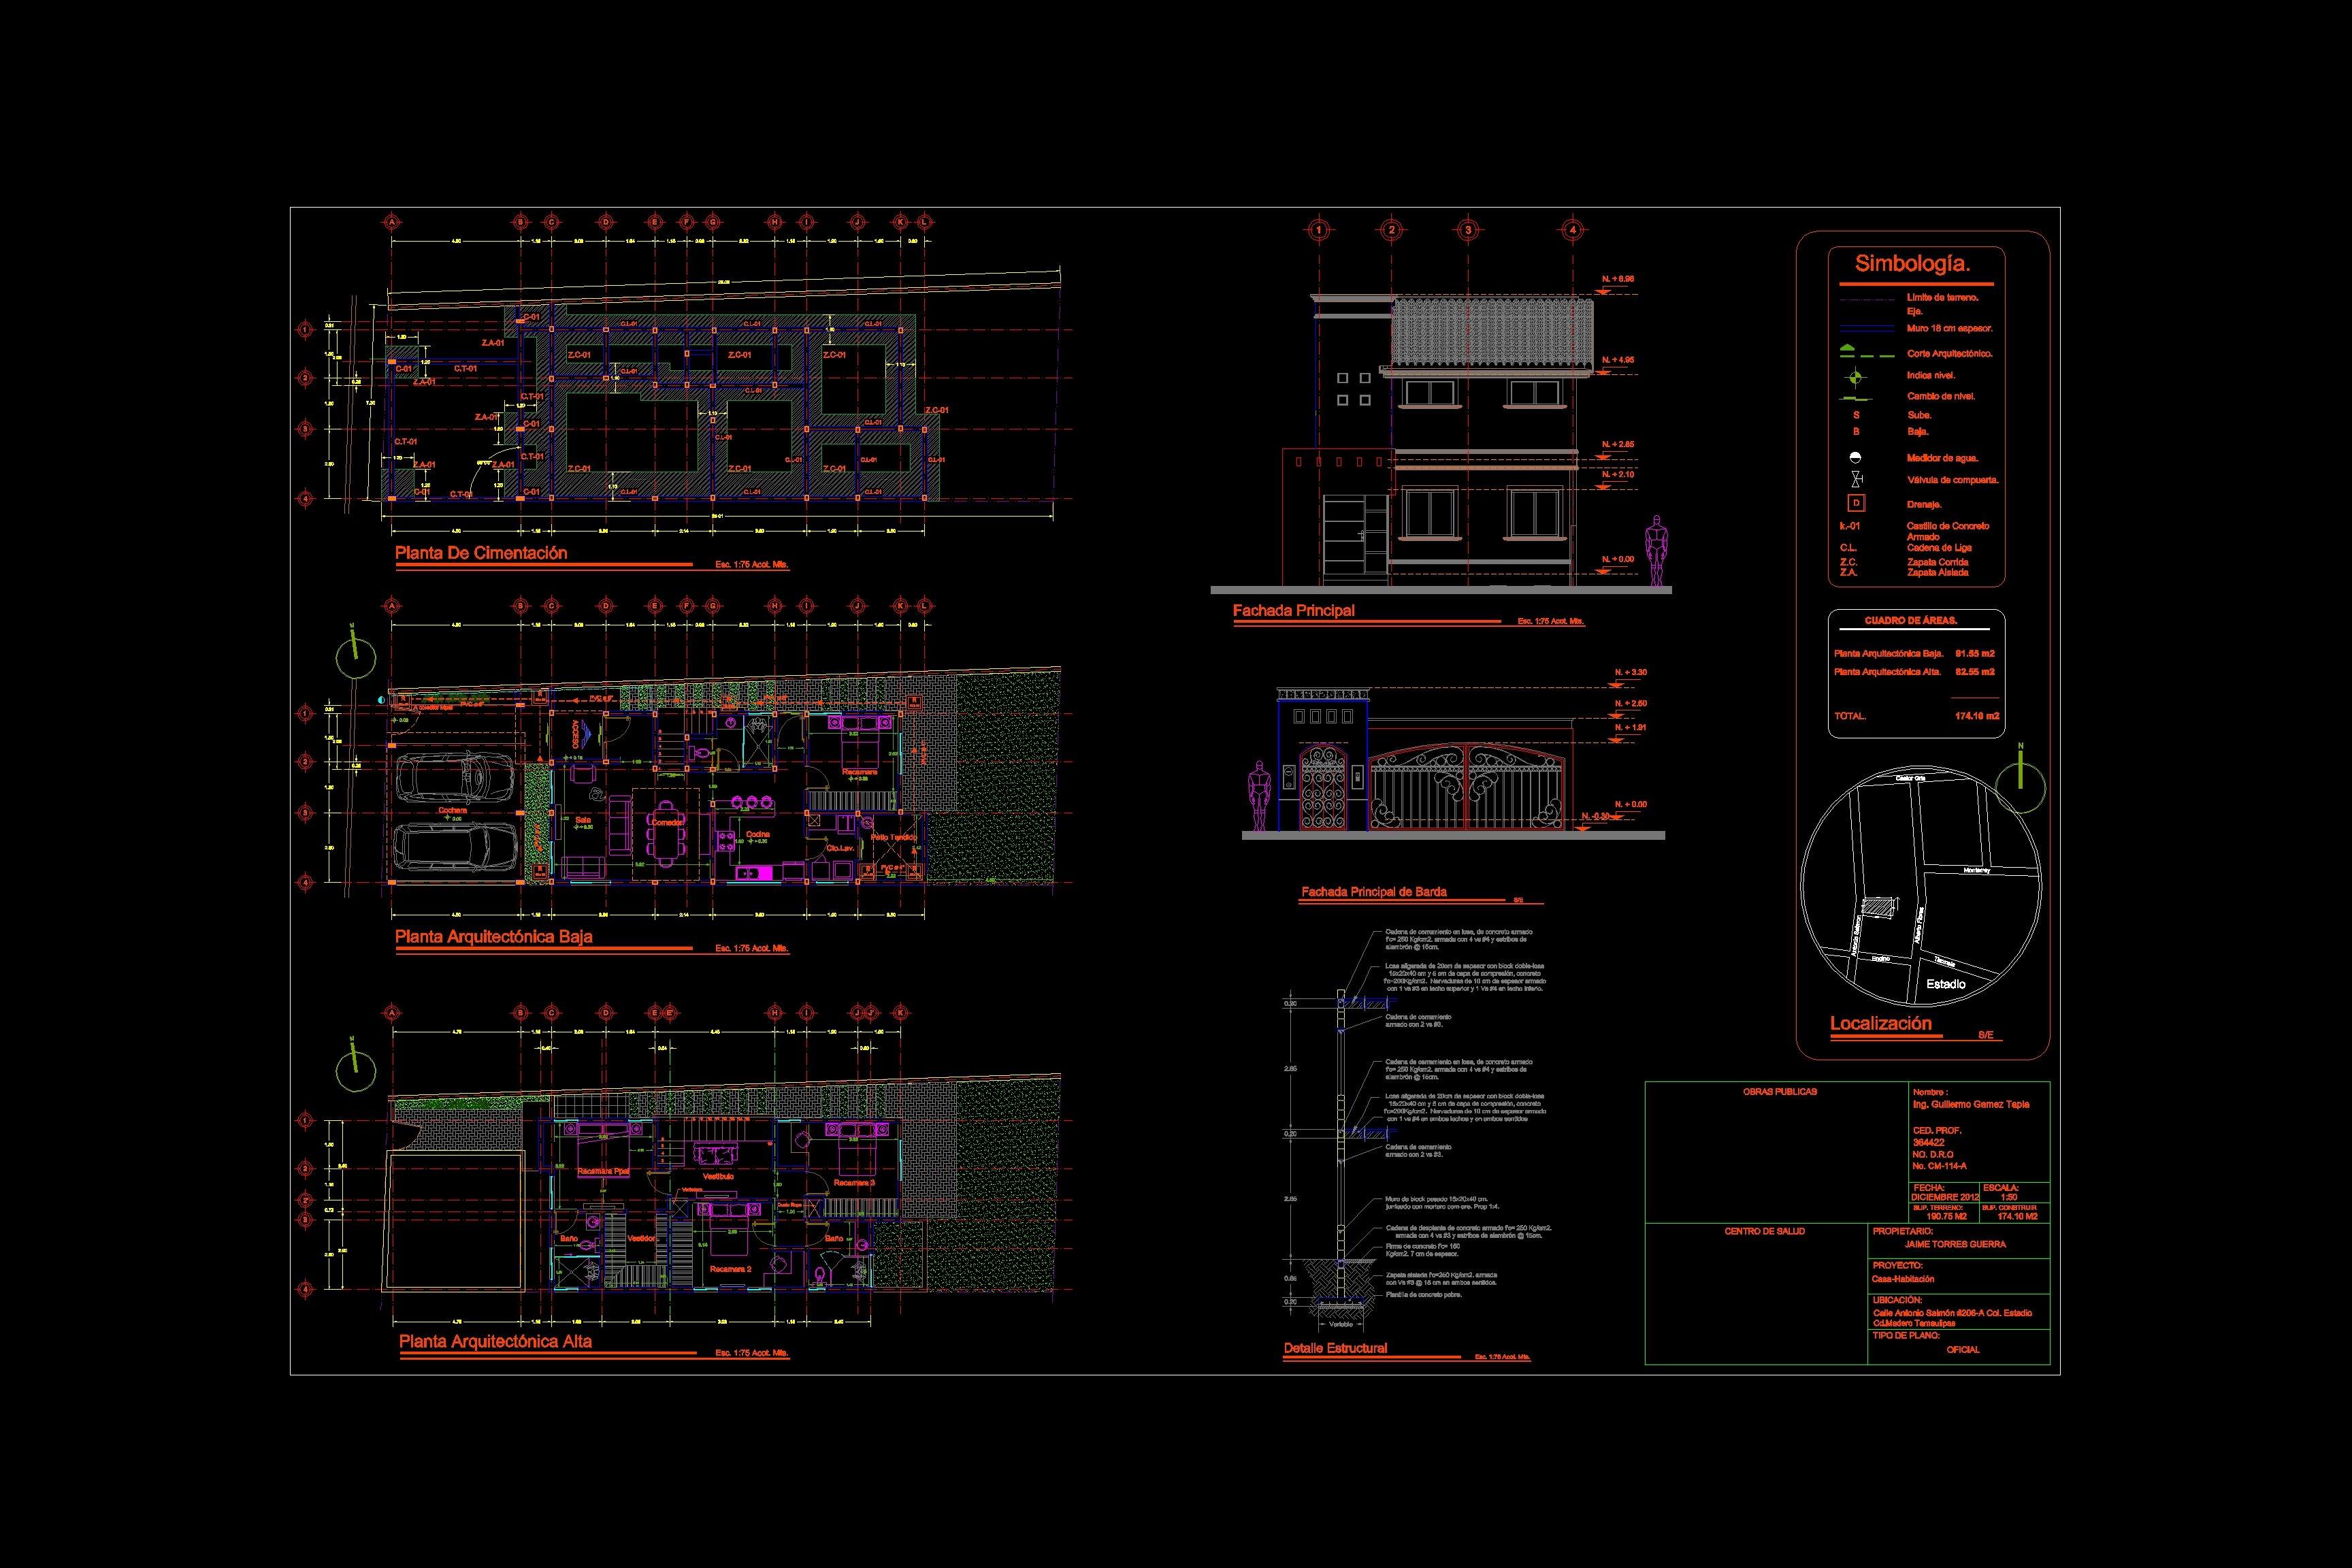 Descarga gratis plano ejecutivo planos y bloques en for Simbologia arquitectonica para planos